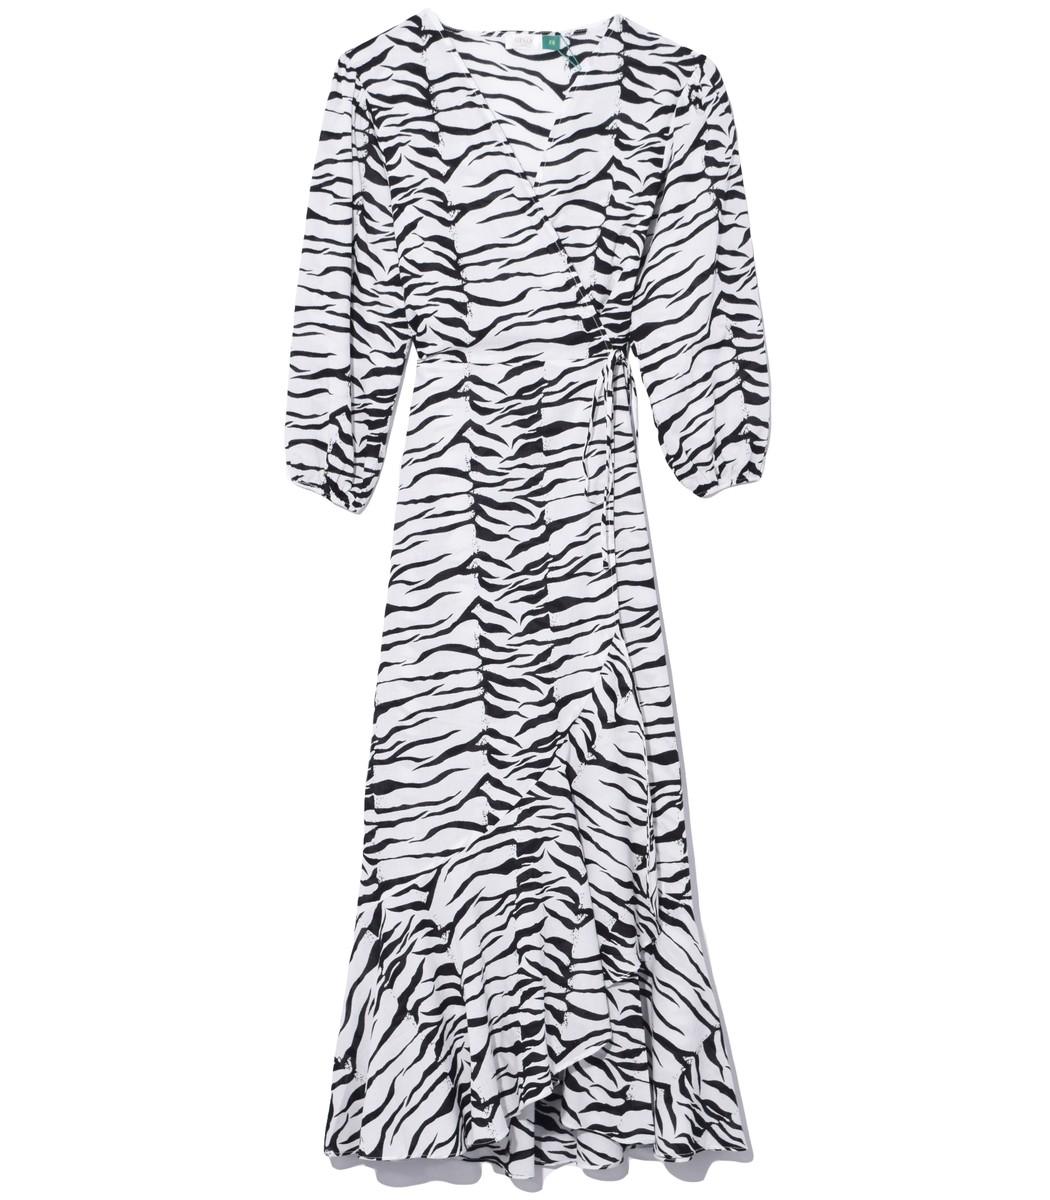 Rixo London Noleen Dress in Mono Tiger